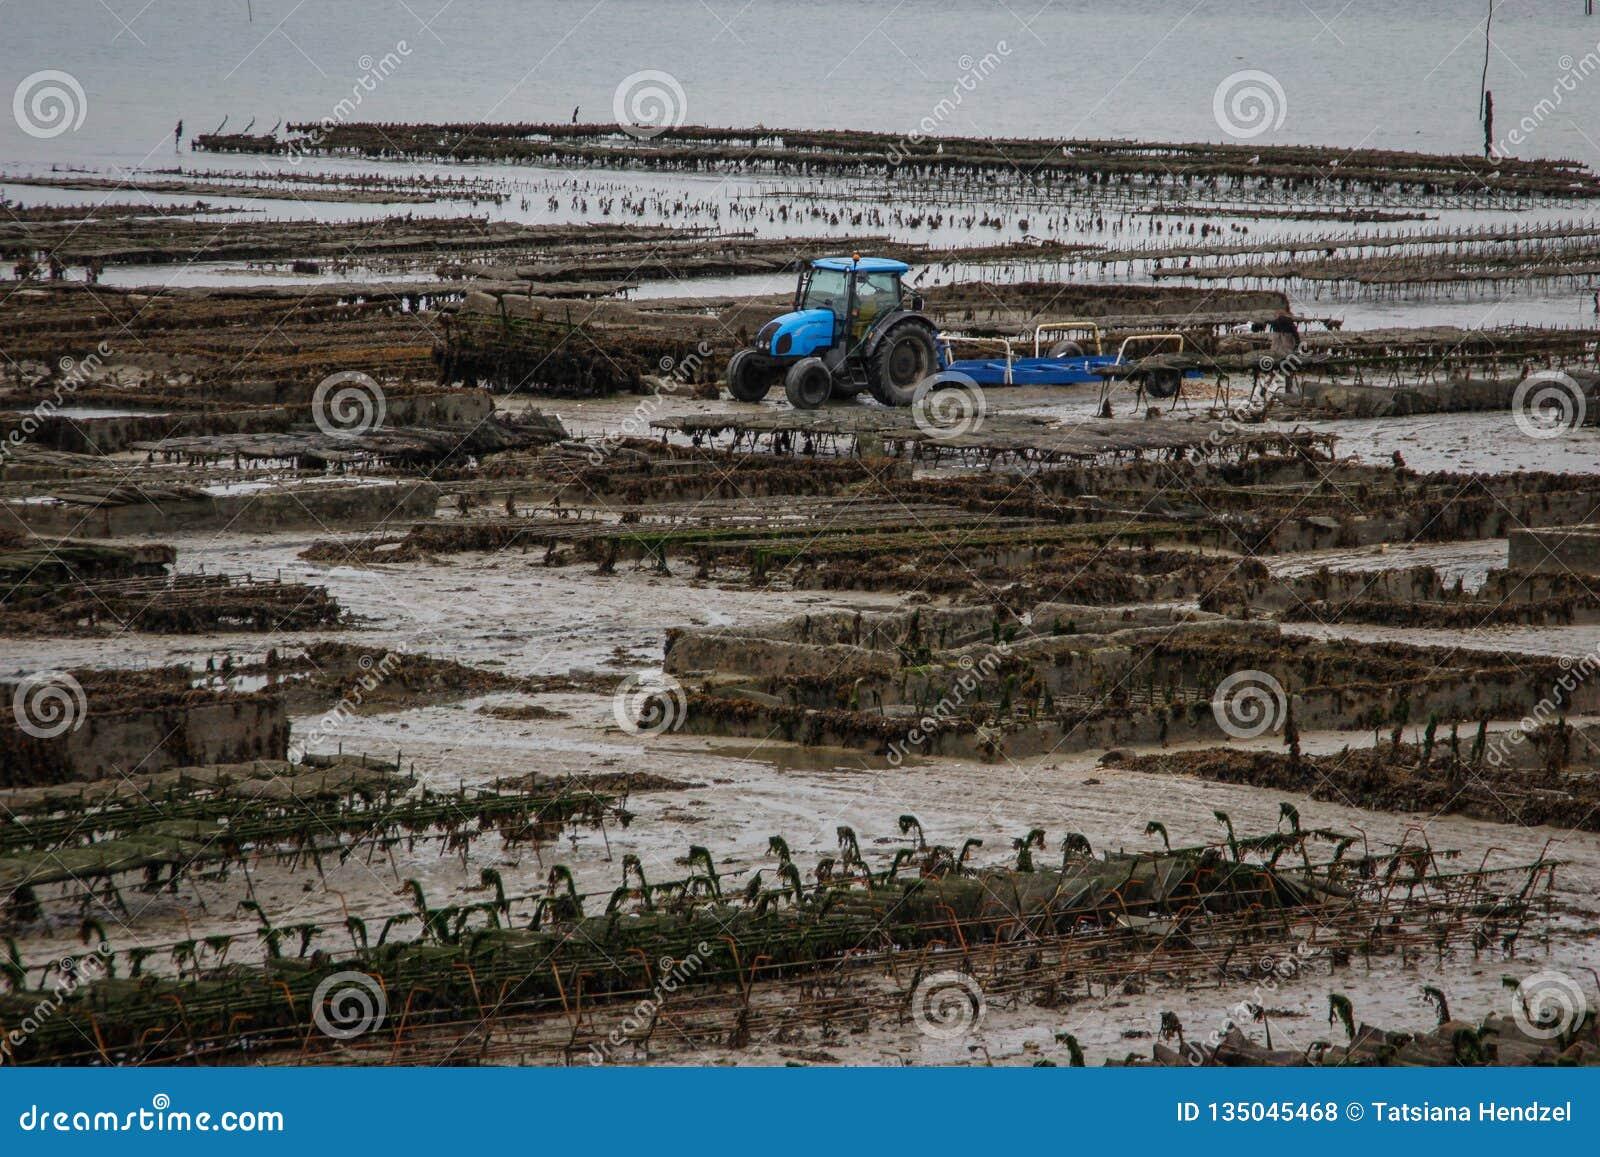 Kelst海的岸的一个海洋牡蛎农场和沿行的蓝色拖拉机工作用牡蛎在诺曼底,法国